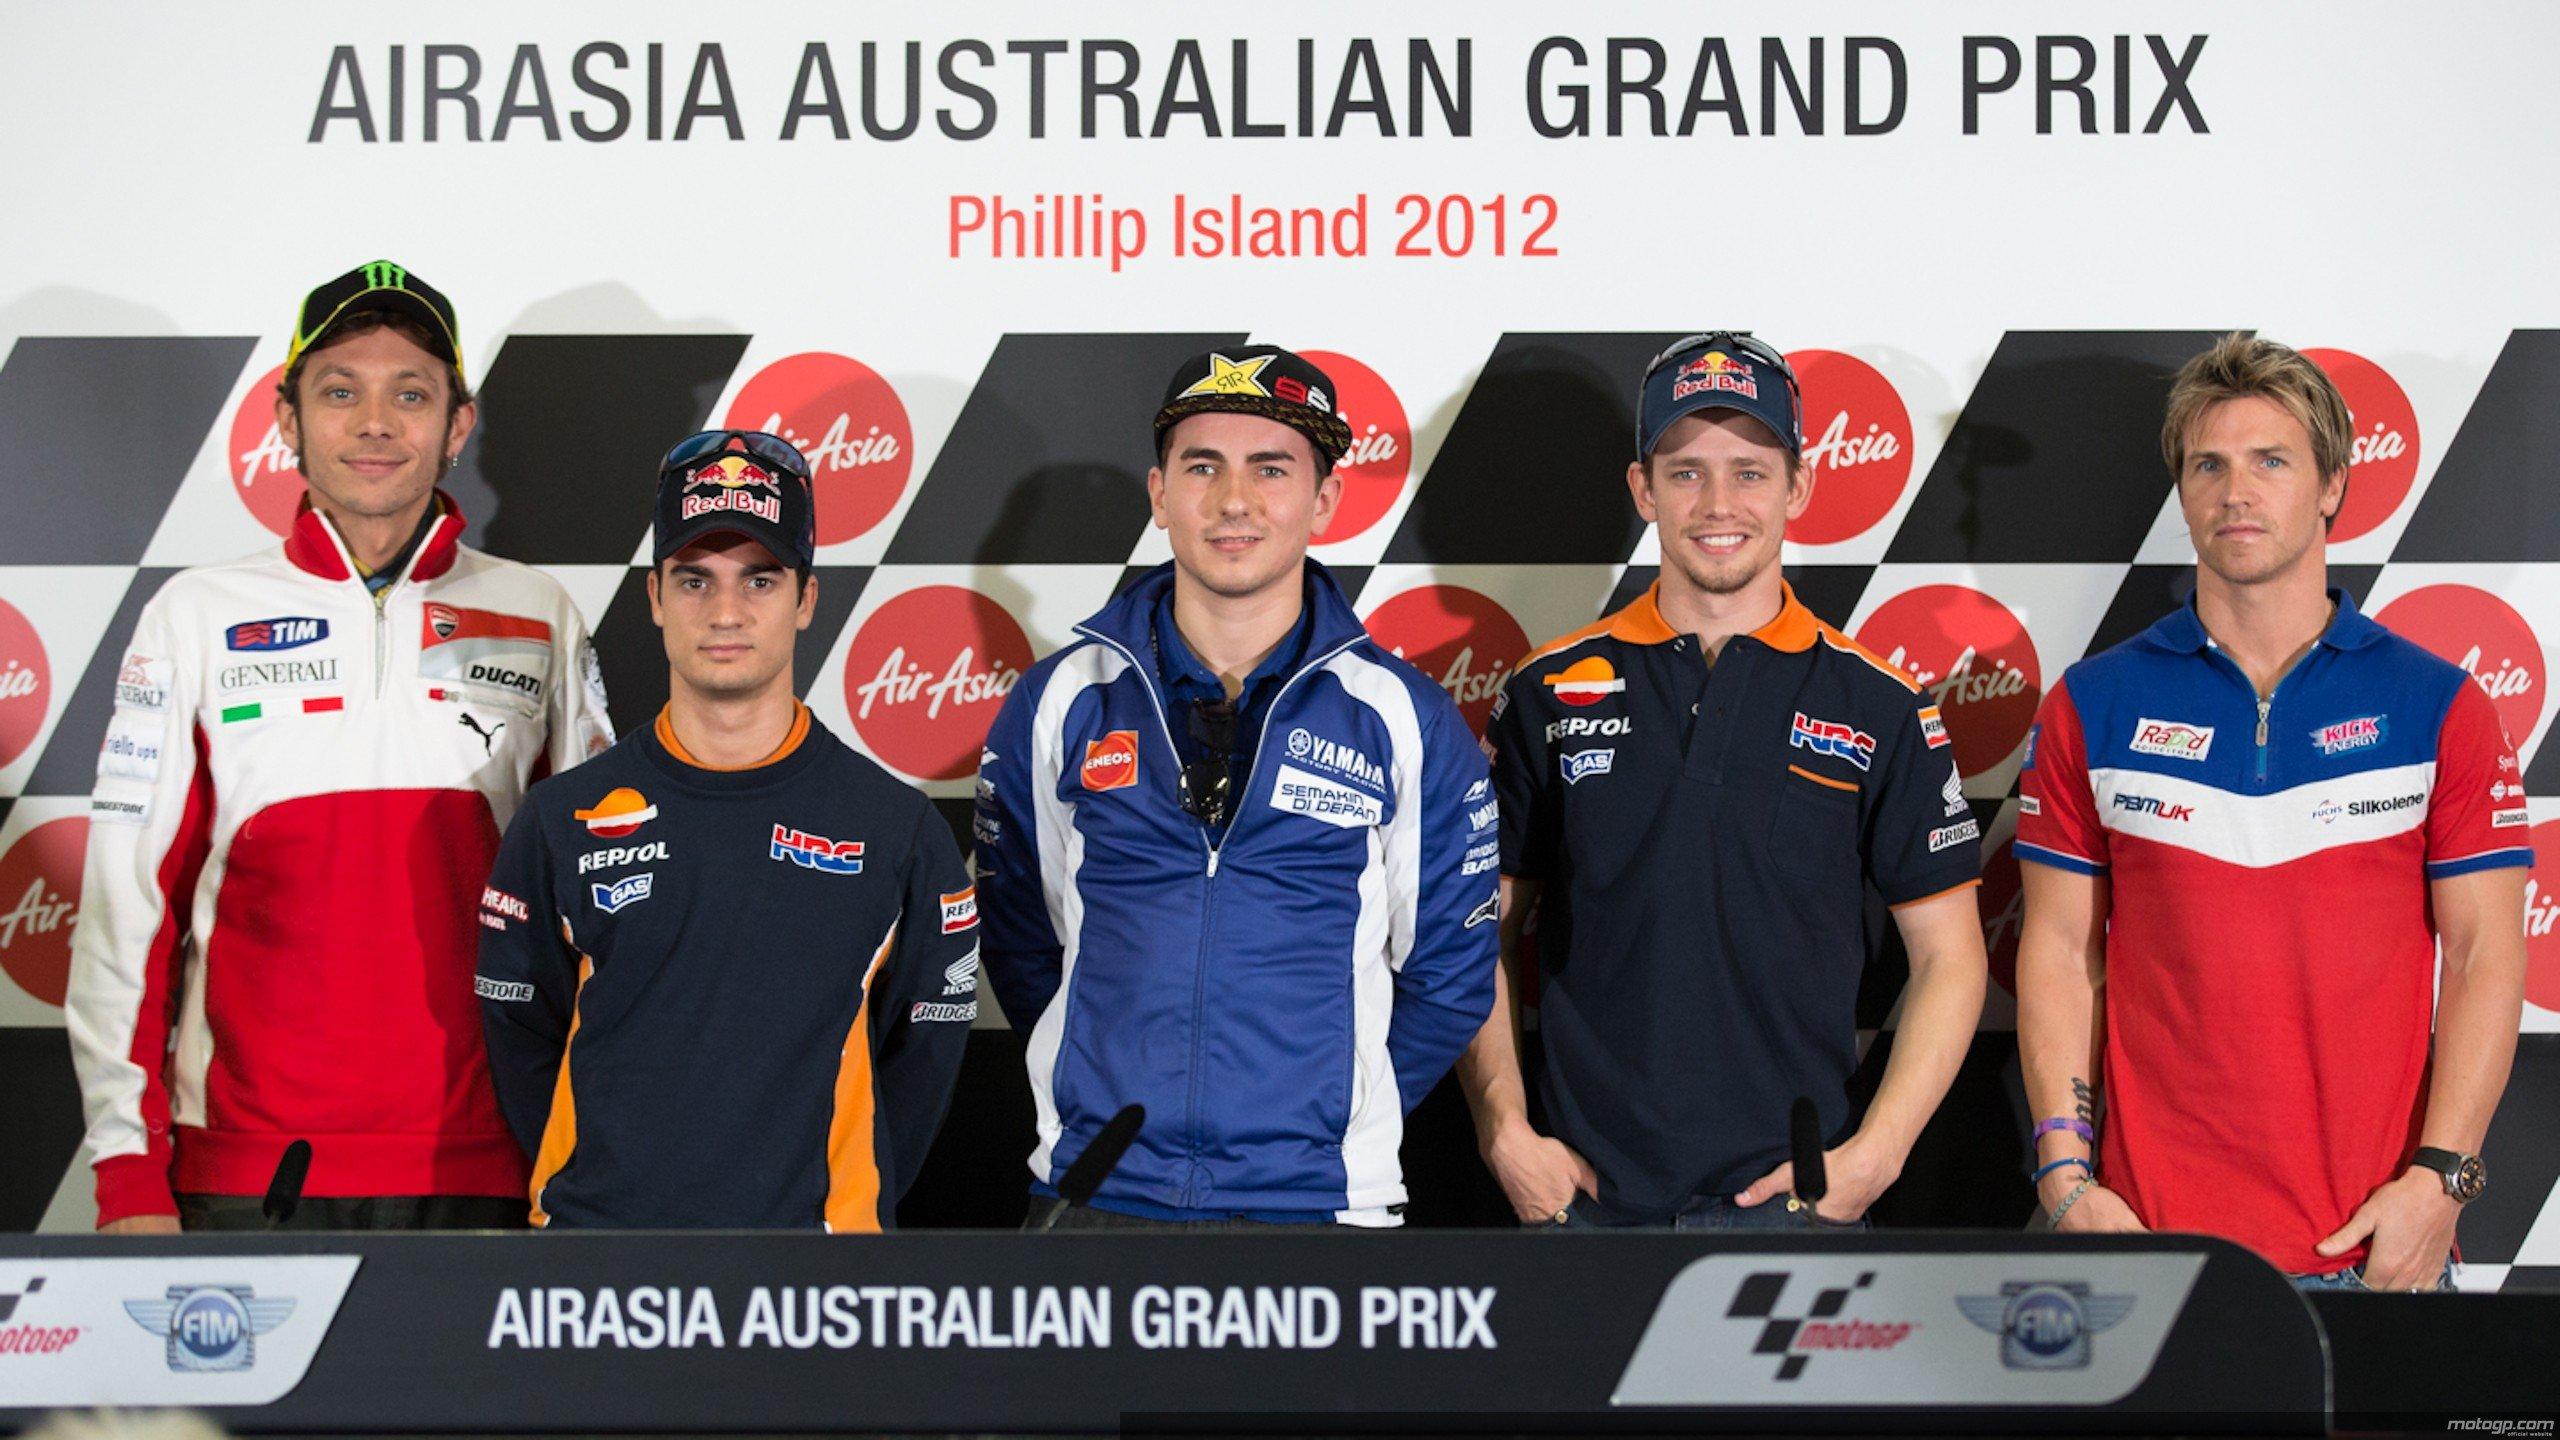 Rueda de prensa oficial del Gran Premio AirAsia de Australia